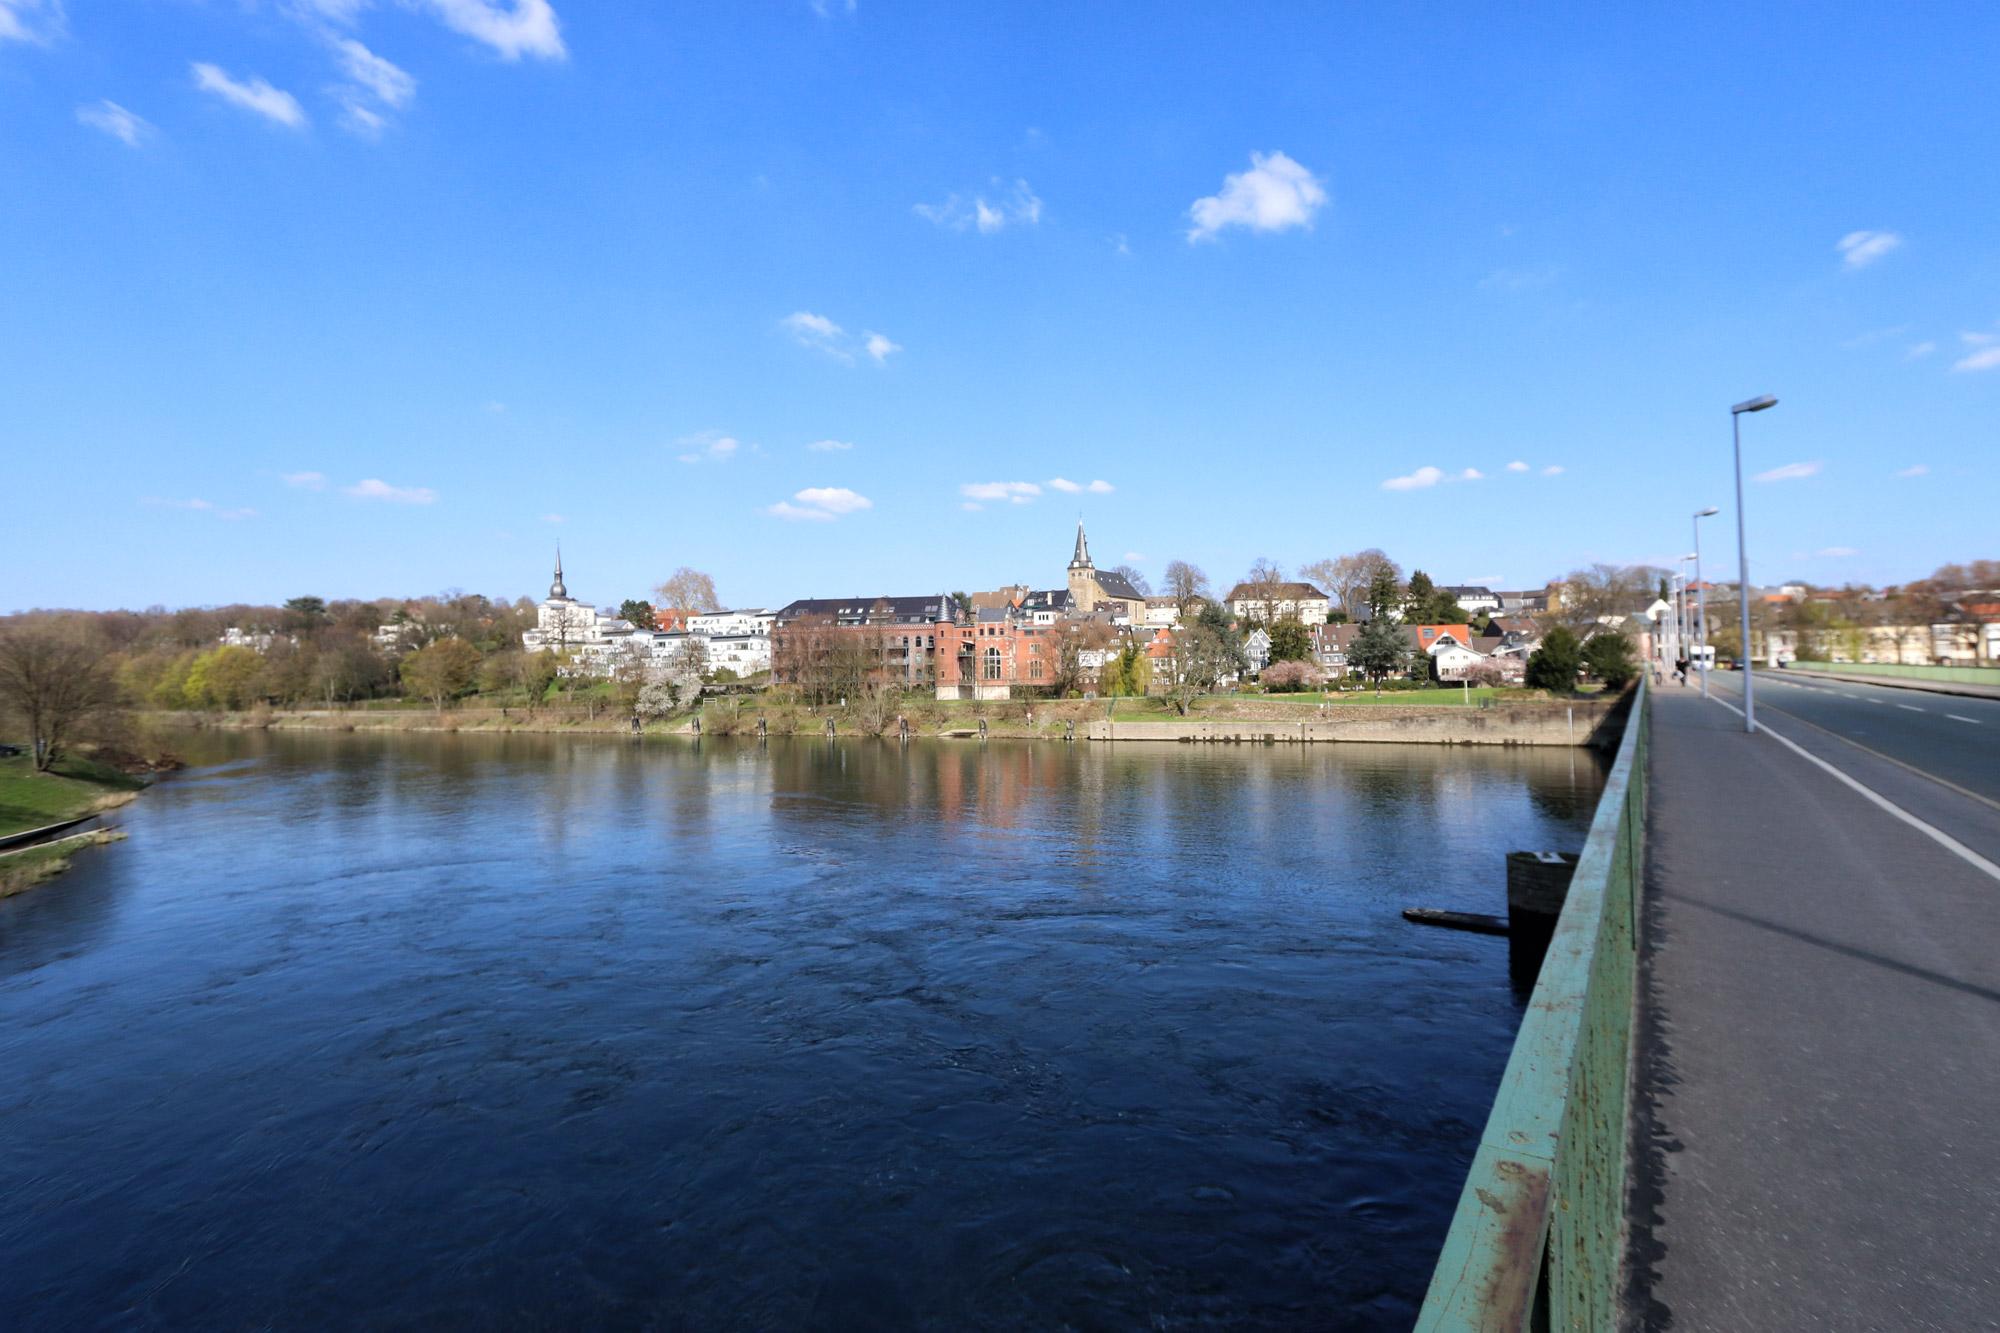 Essen-Kettwig - Ruhrbrücke